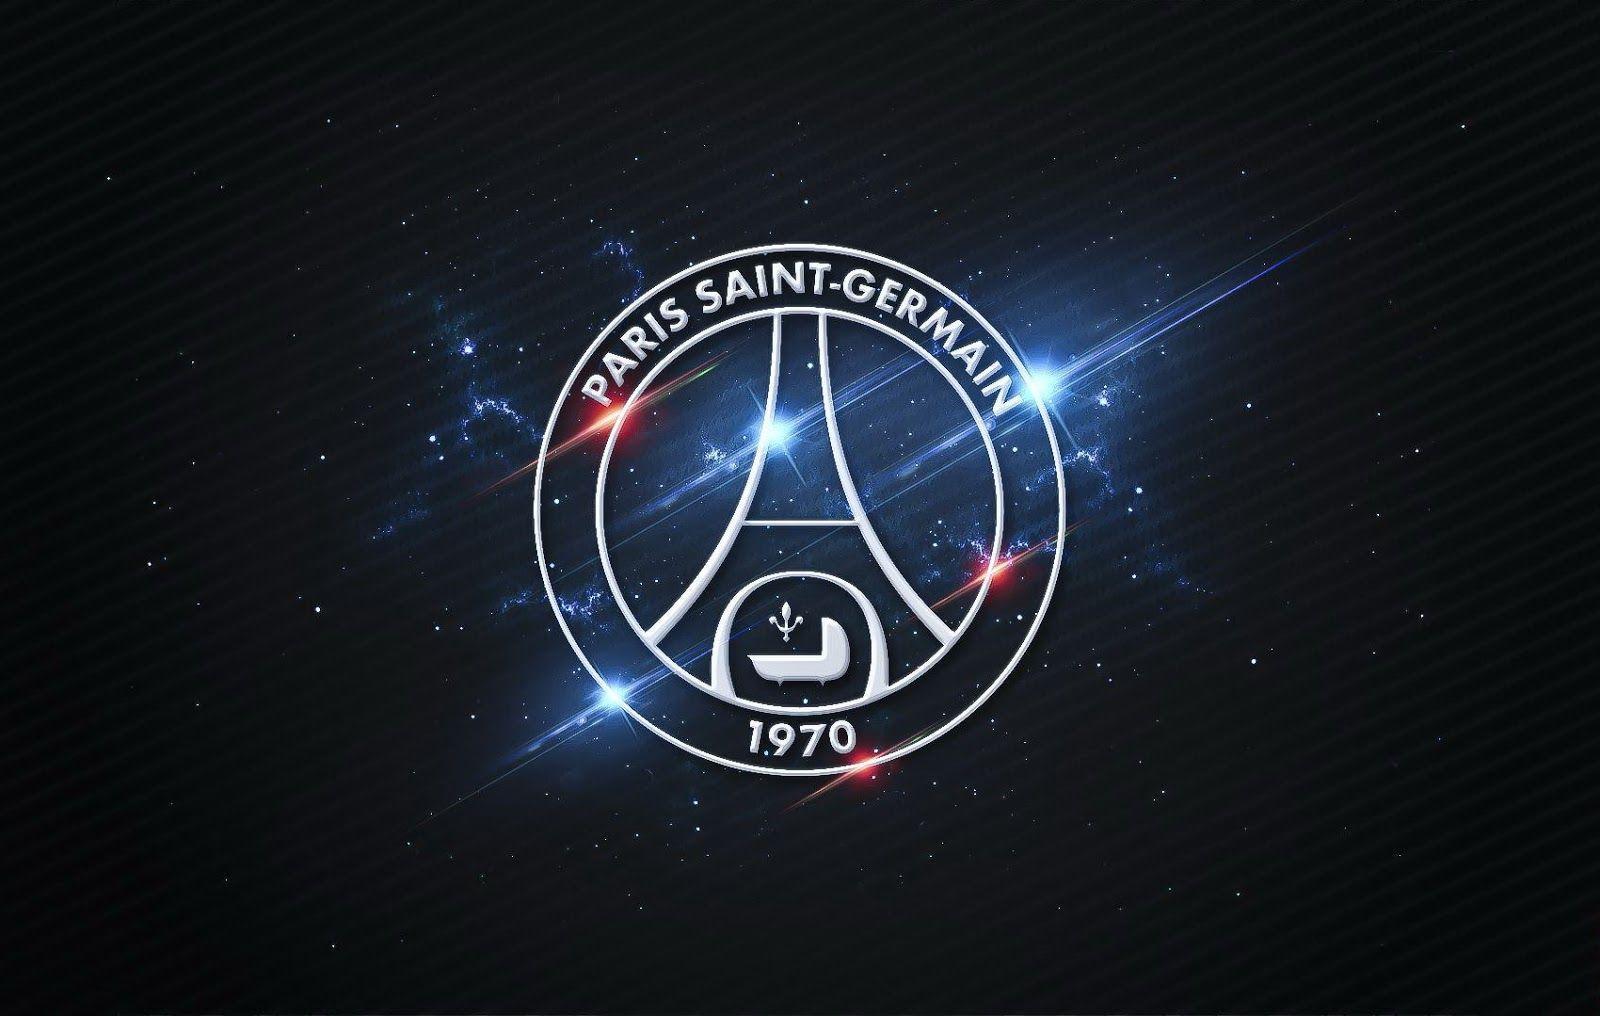 Paris Saint-Germain F.C. Zoom Background 4